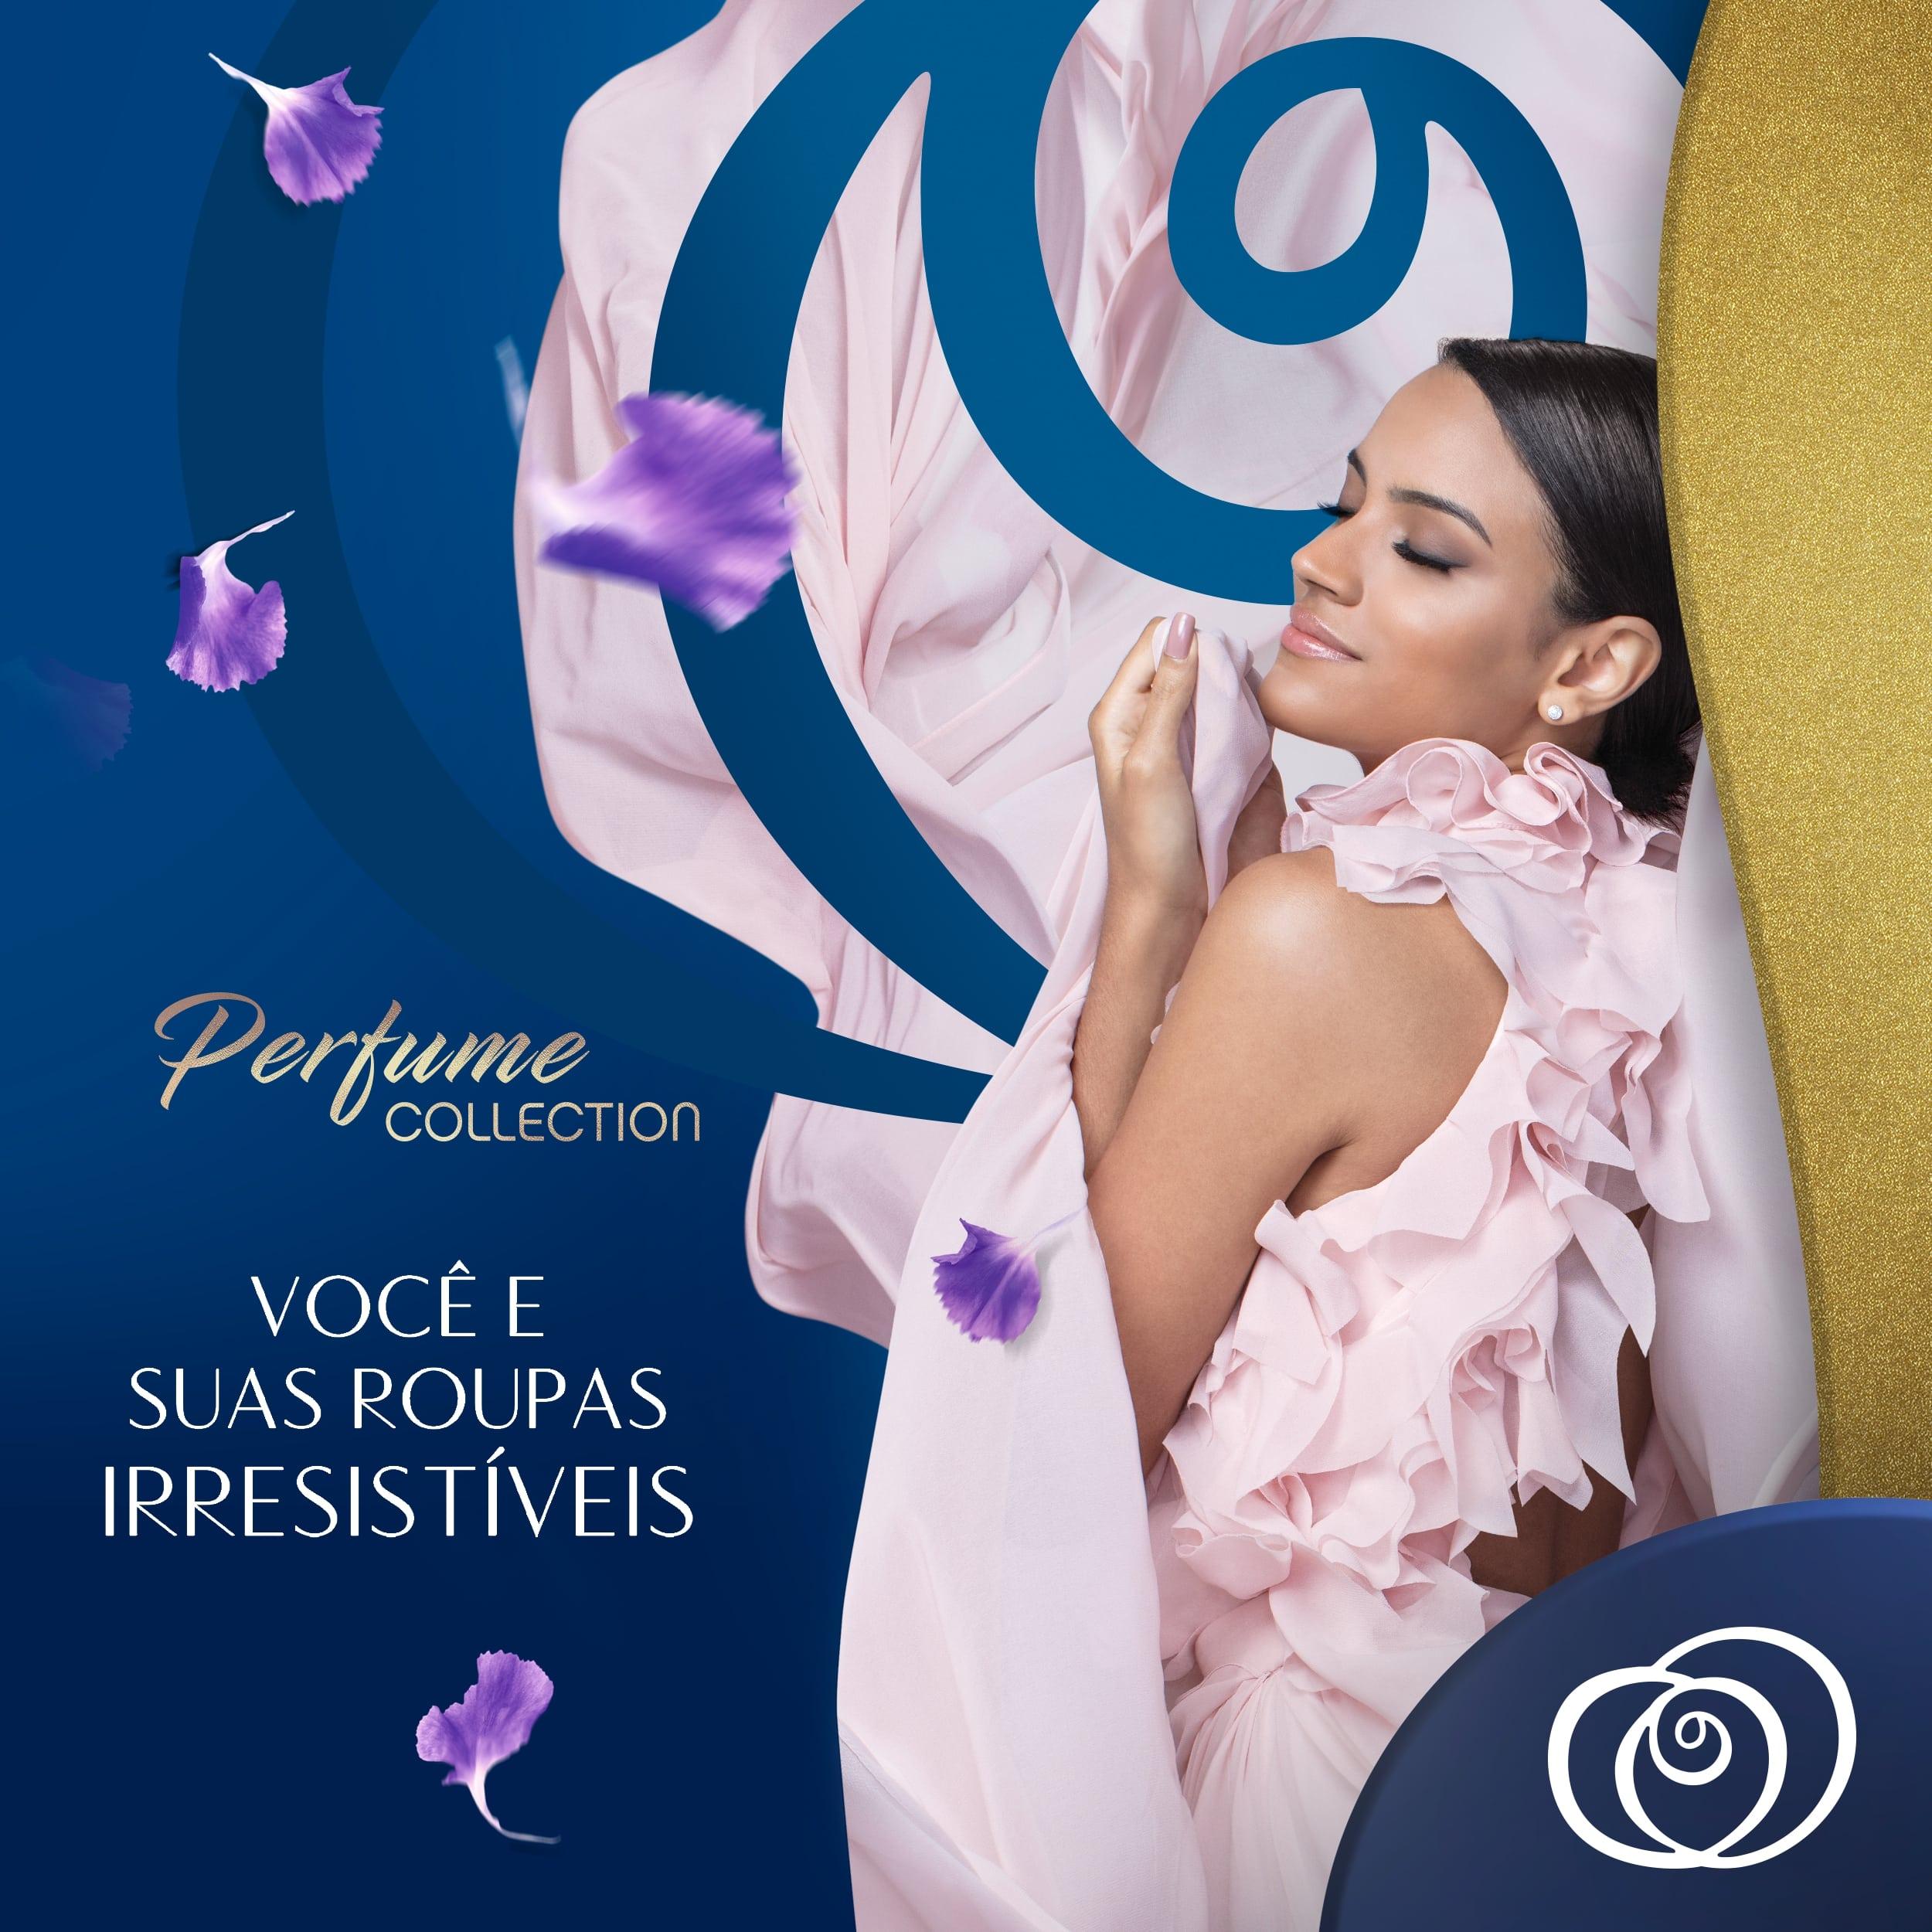 Amaciante Downy Perfume Collection Liberdade Secondary 05